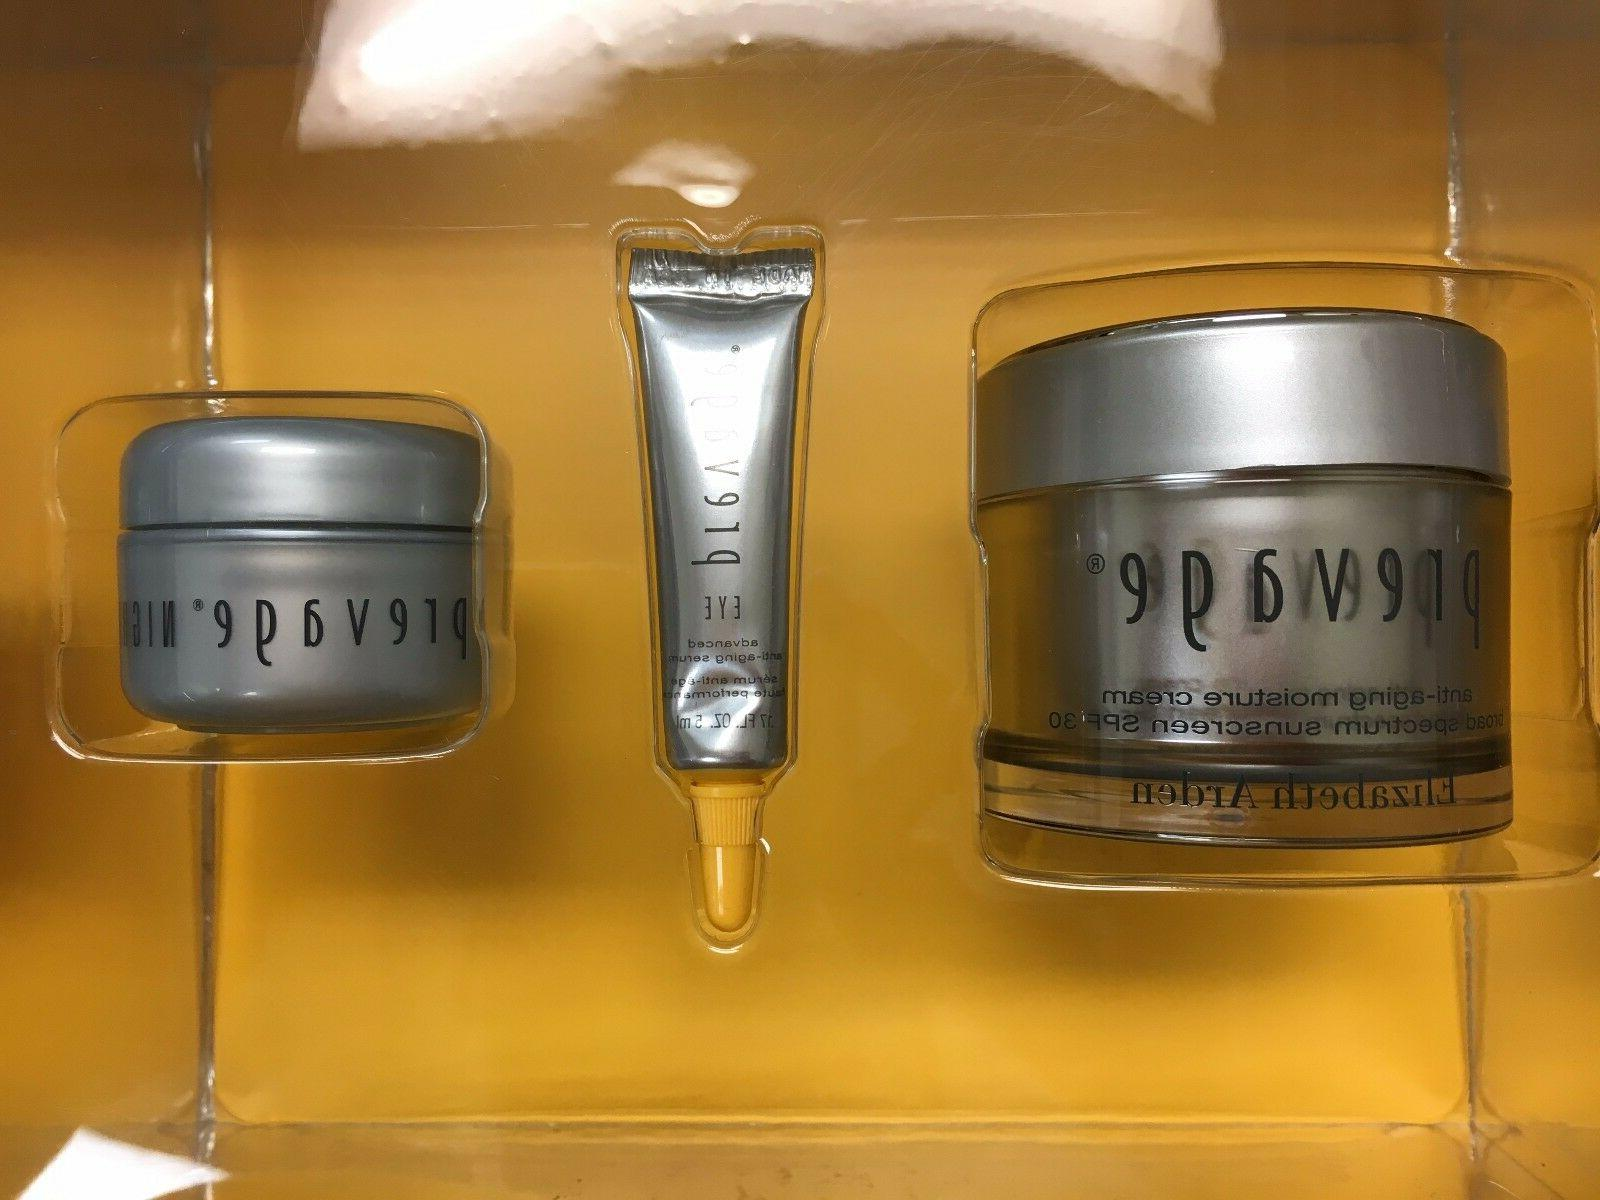 elizabeth arden prevage anti aging moisture cream